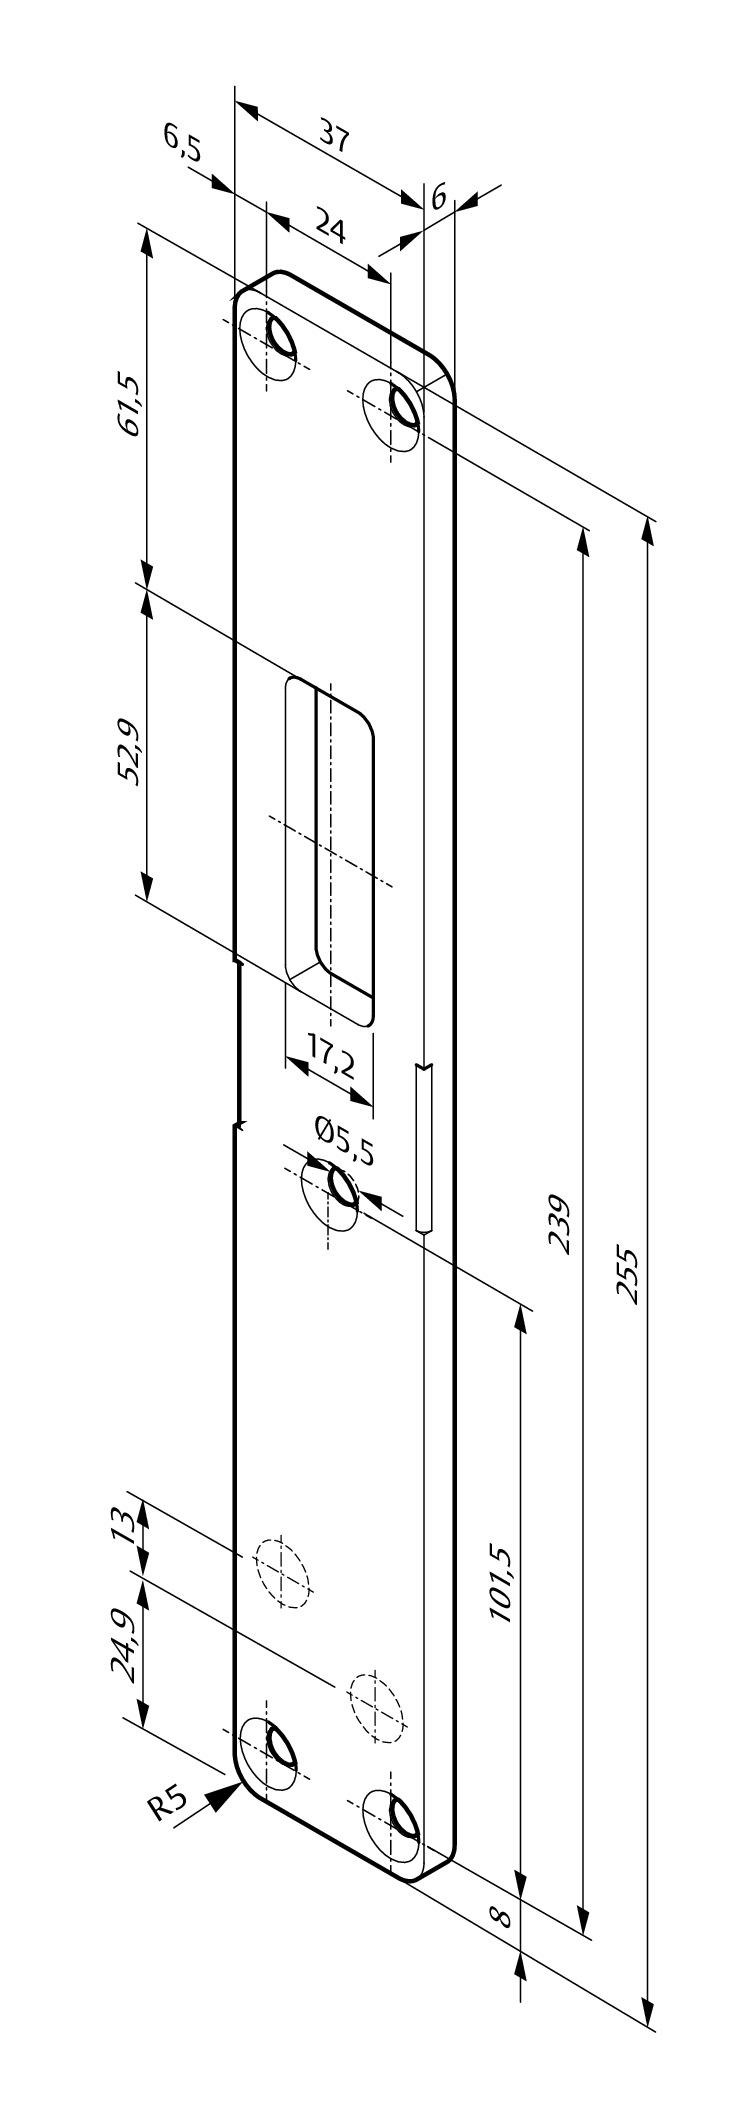 Assa Abloy M4 Schematic Replacement Striking Plates L4